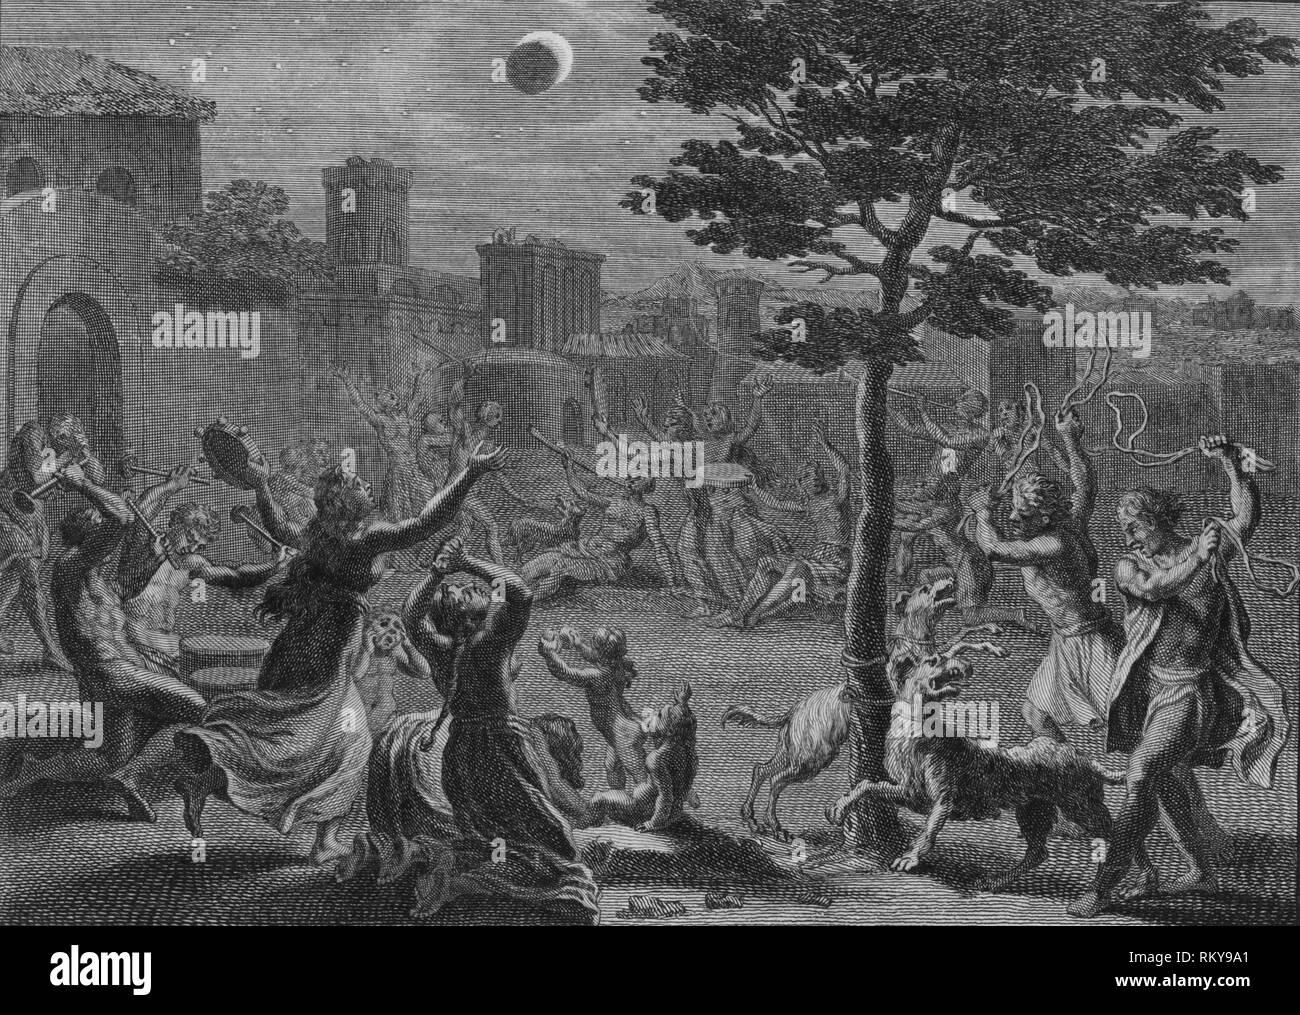 'Desolation des Peruviens pendant L'Eclipse de Lune', 1723.  Creator: Bernard Picart. - Stock Image